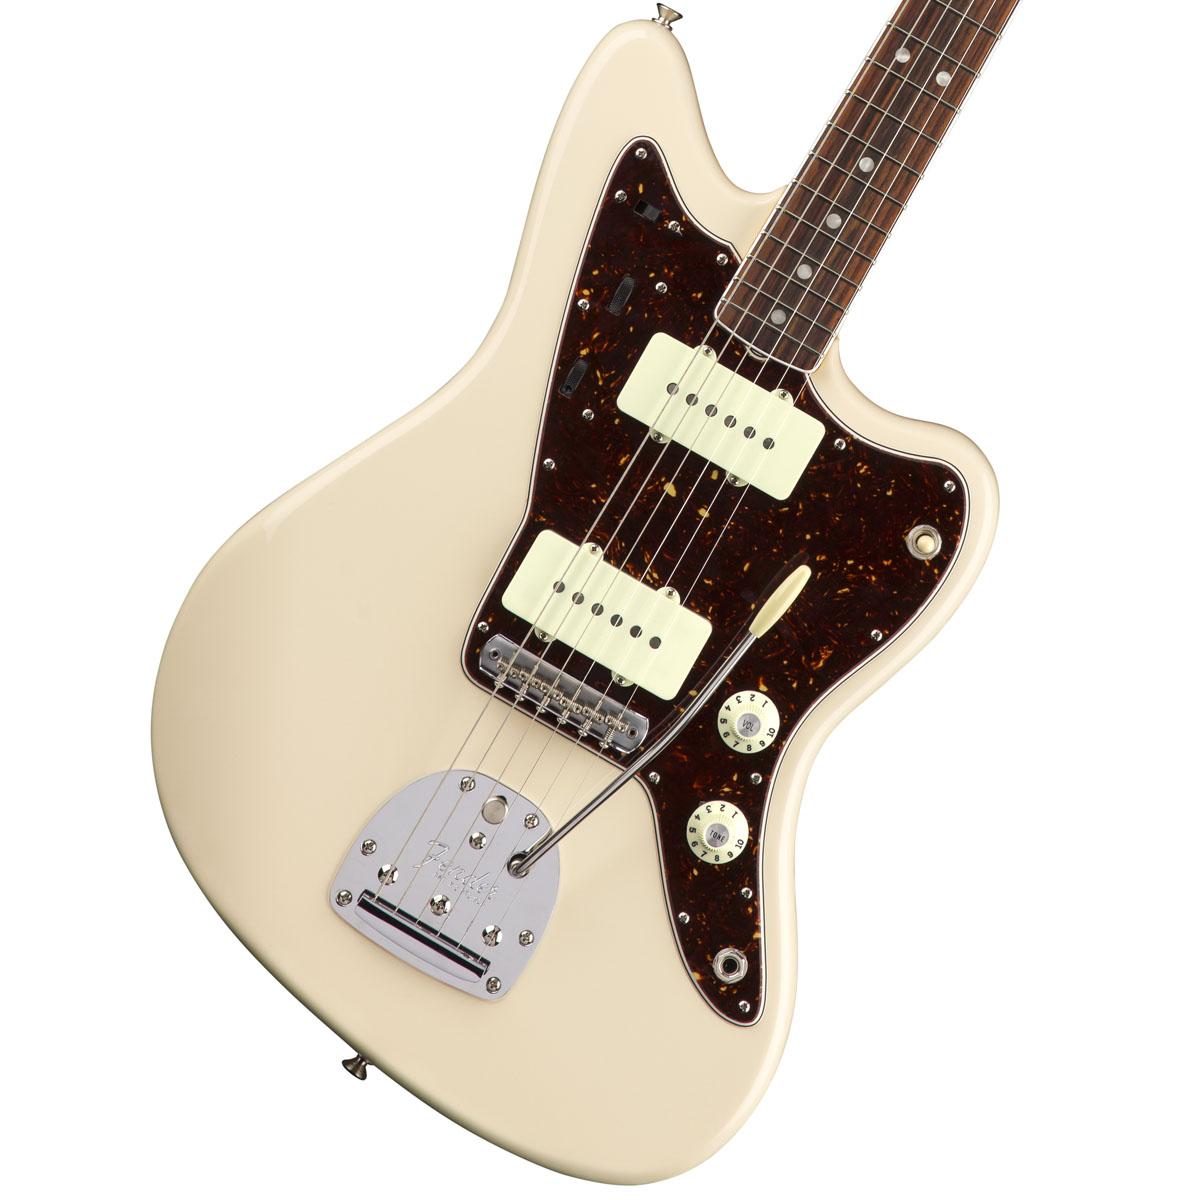 Fender USA / American Original 60s Jazzmaster Olympic White 《カスタムショップのお手入れ用品を進呈/+671038200》《フェンダー純正グッズを進呈/+79083》